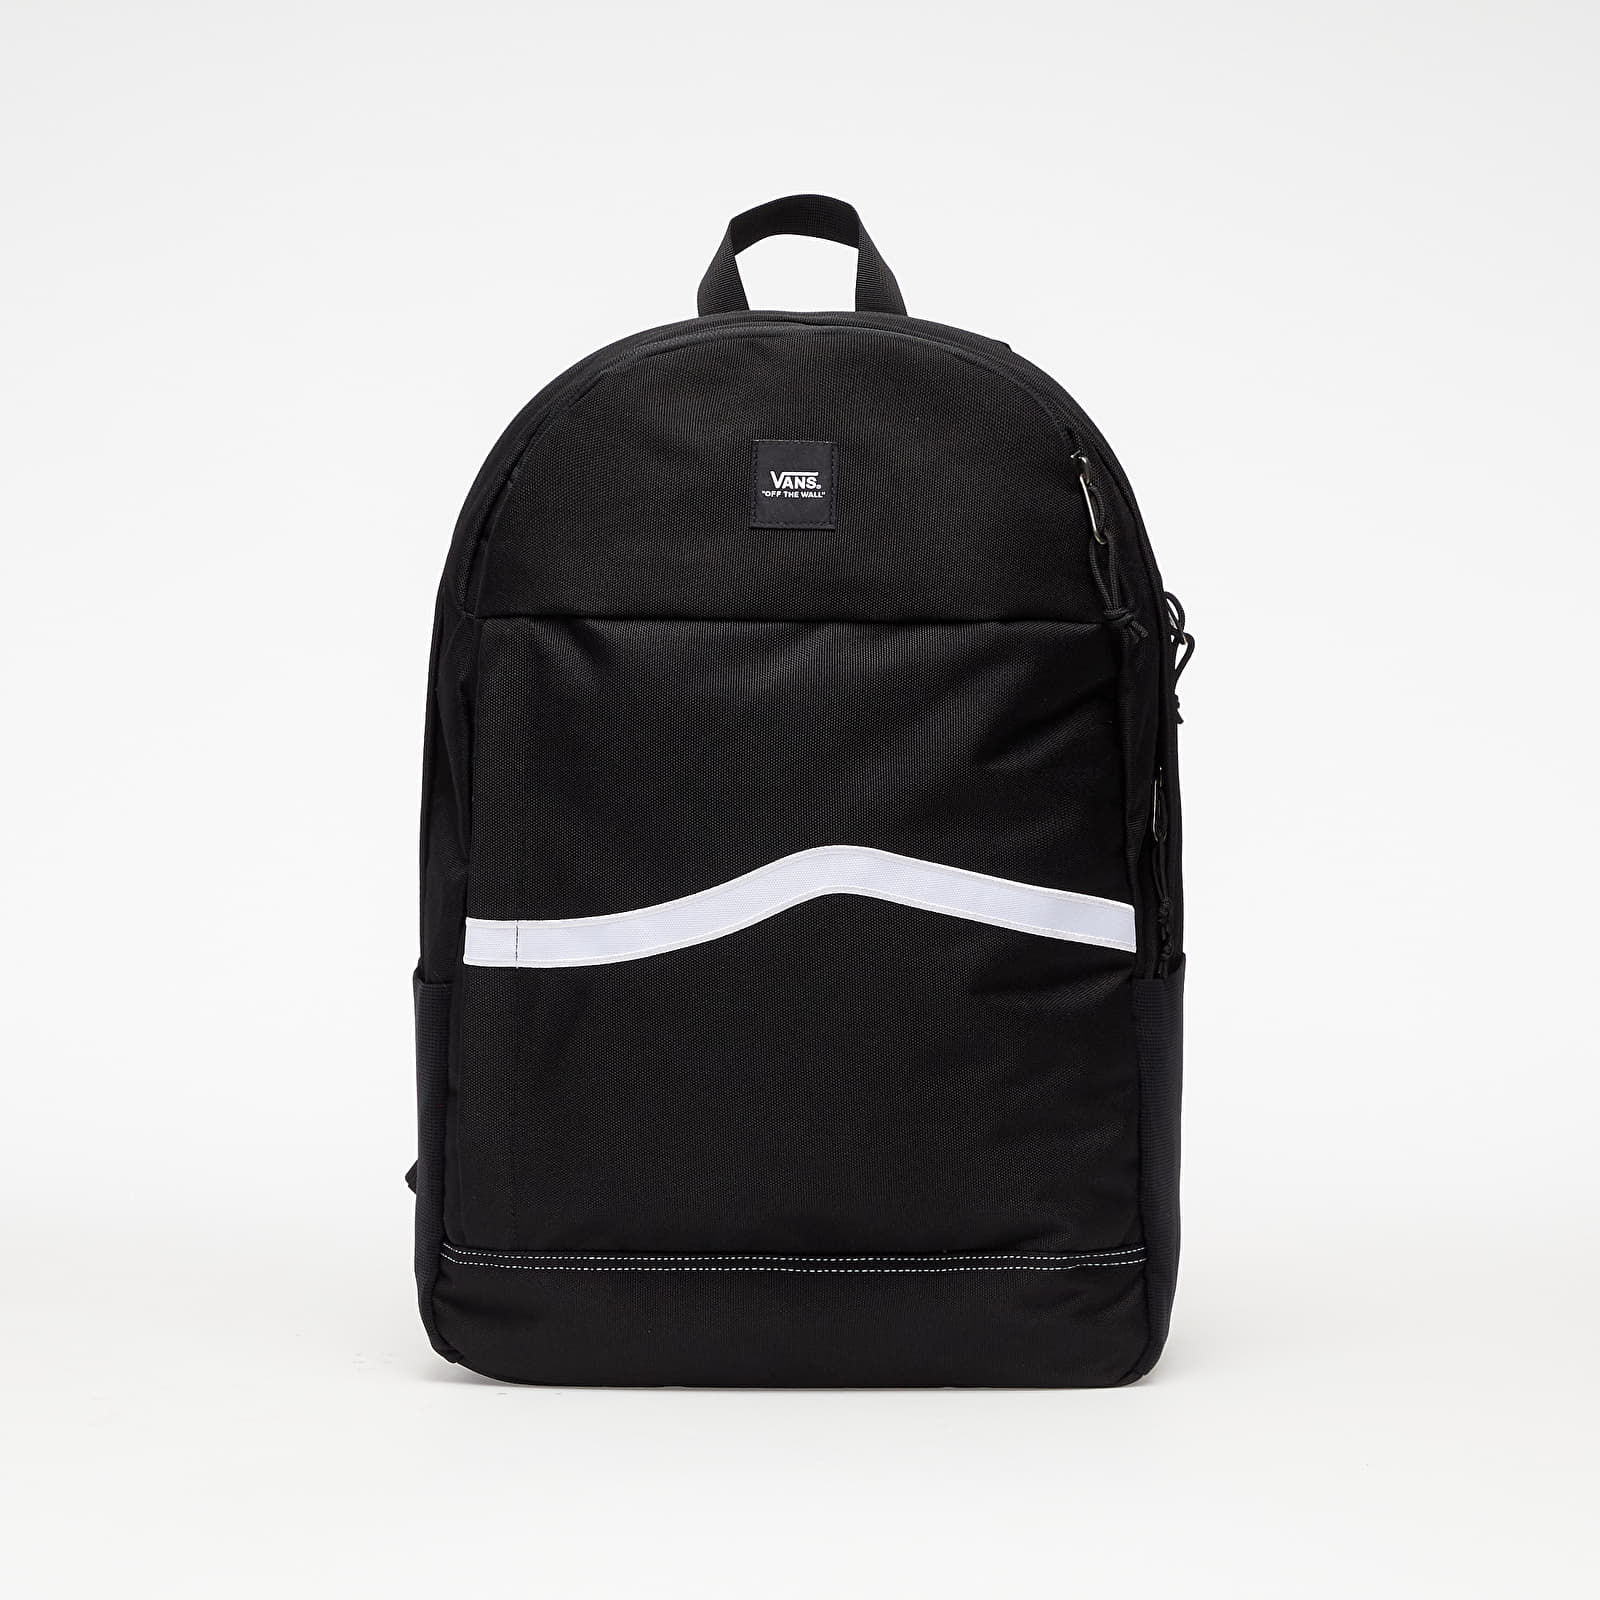 Vans Construct Backpack Black/ White univerzálna